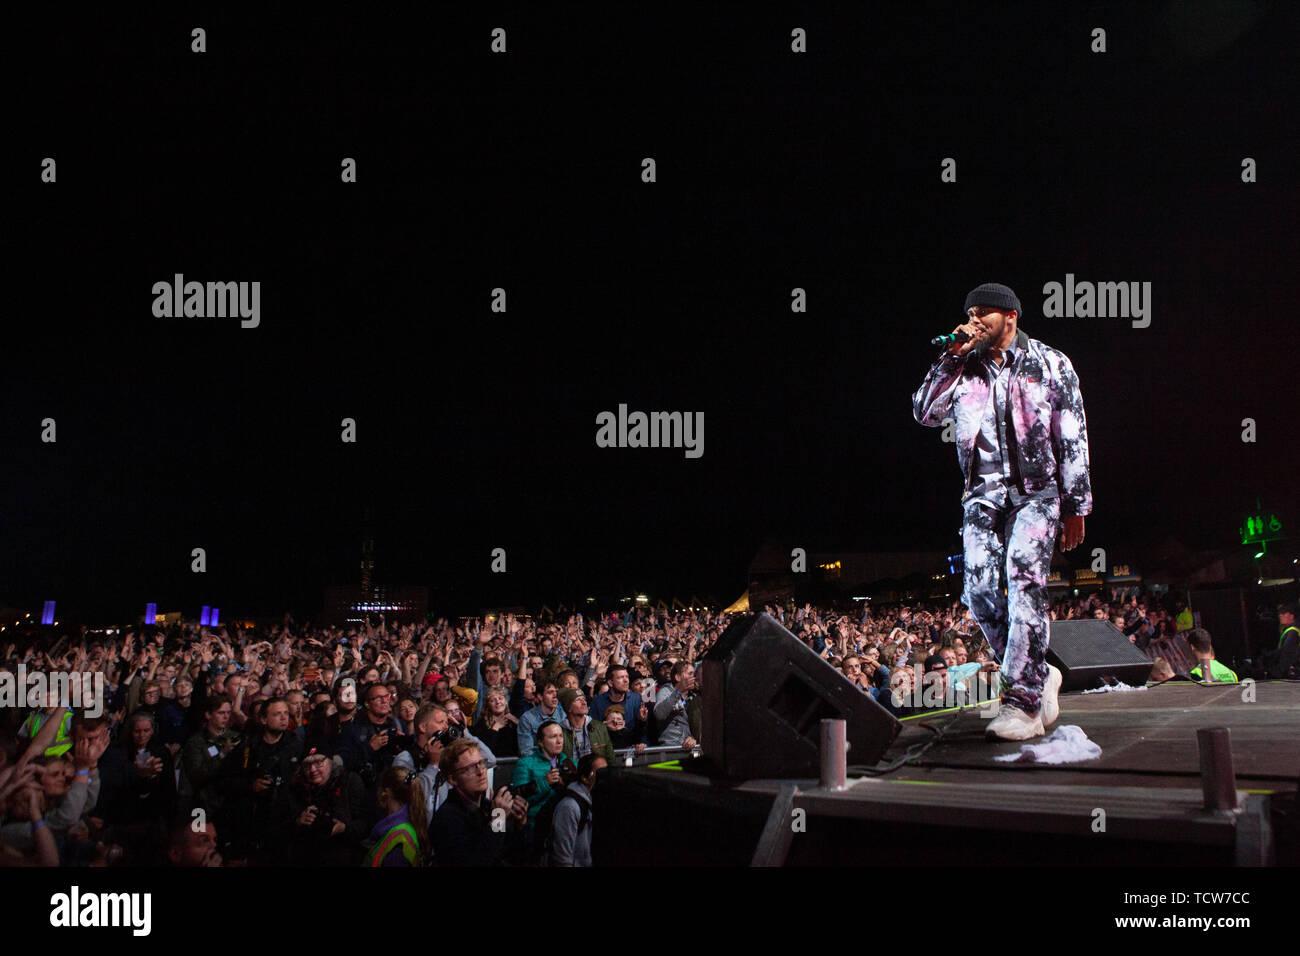 Denmark, Aarhus - June 8, 2019  The electronic music project